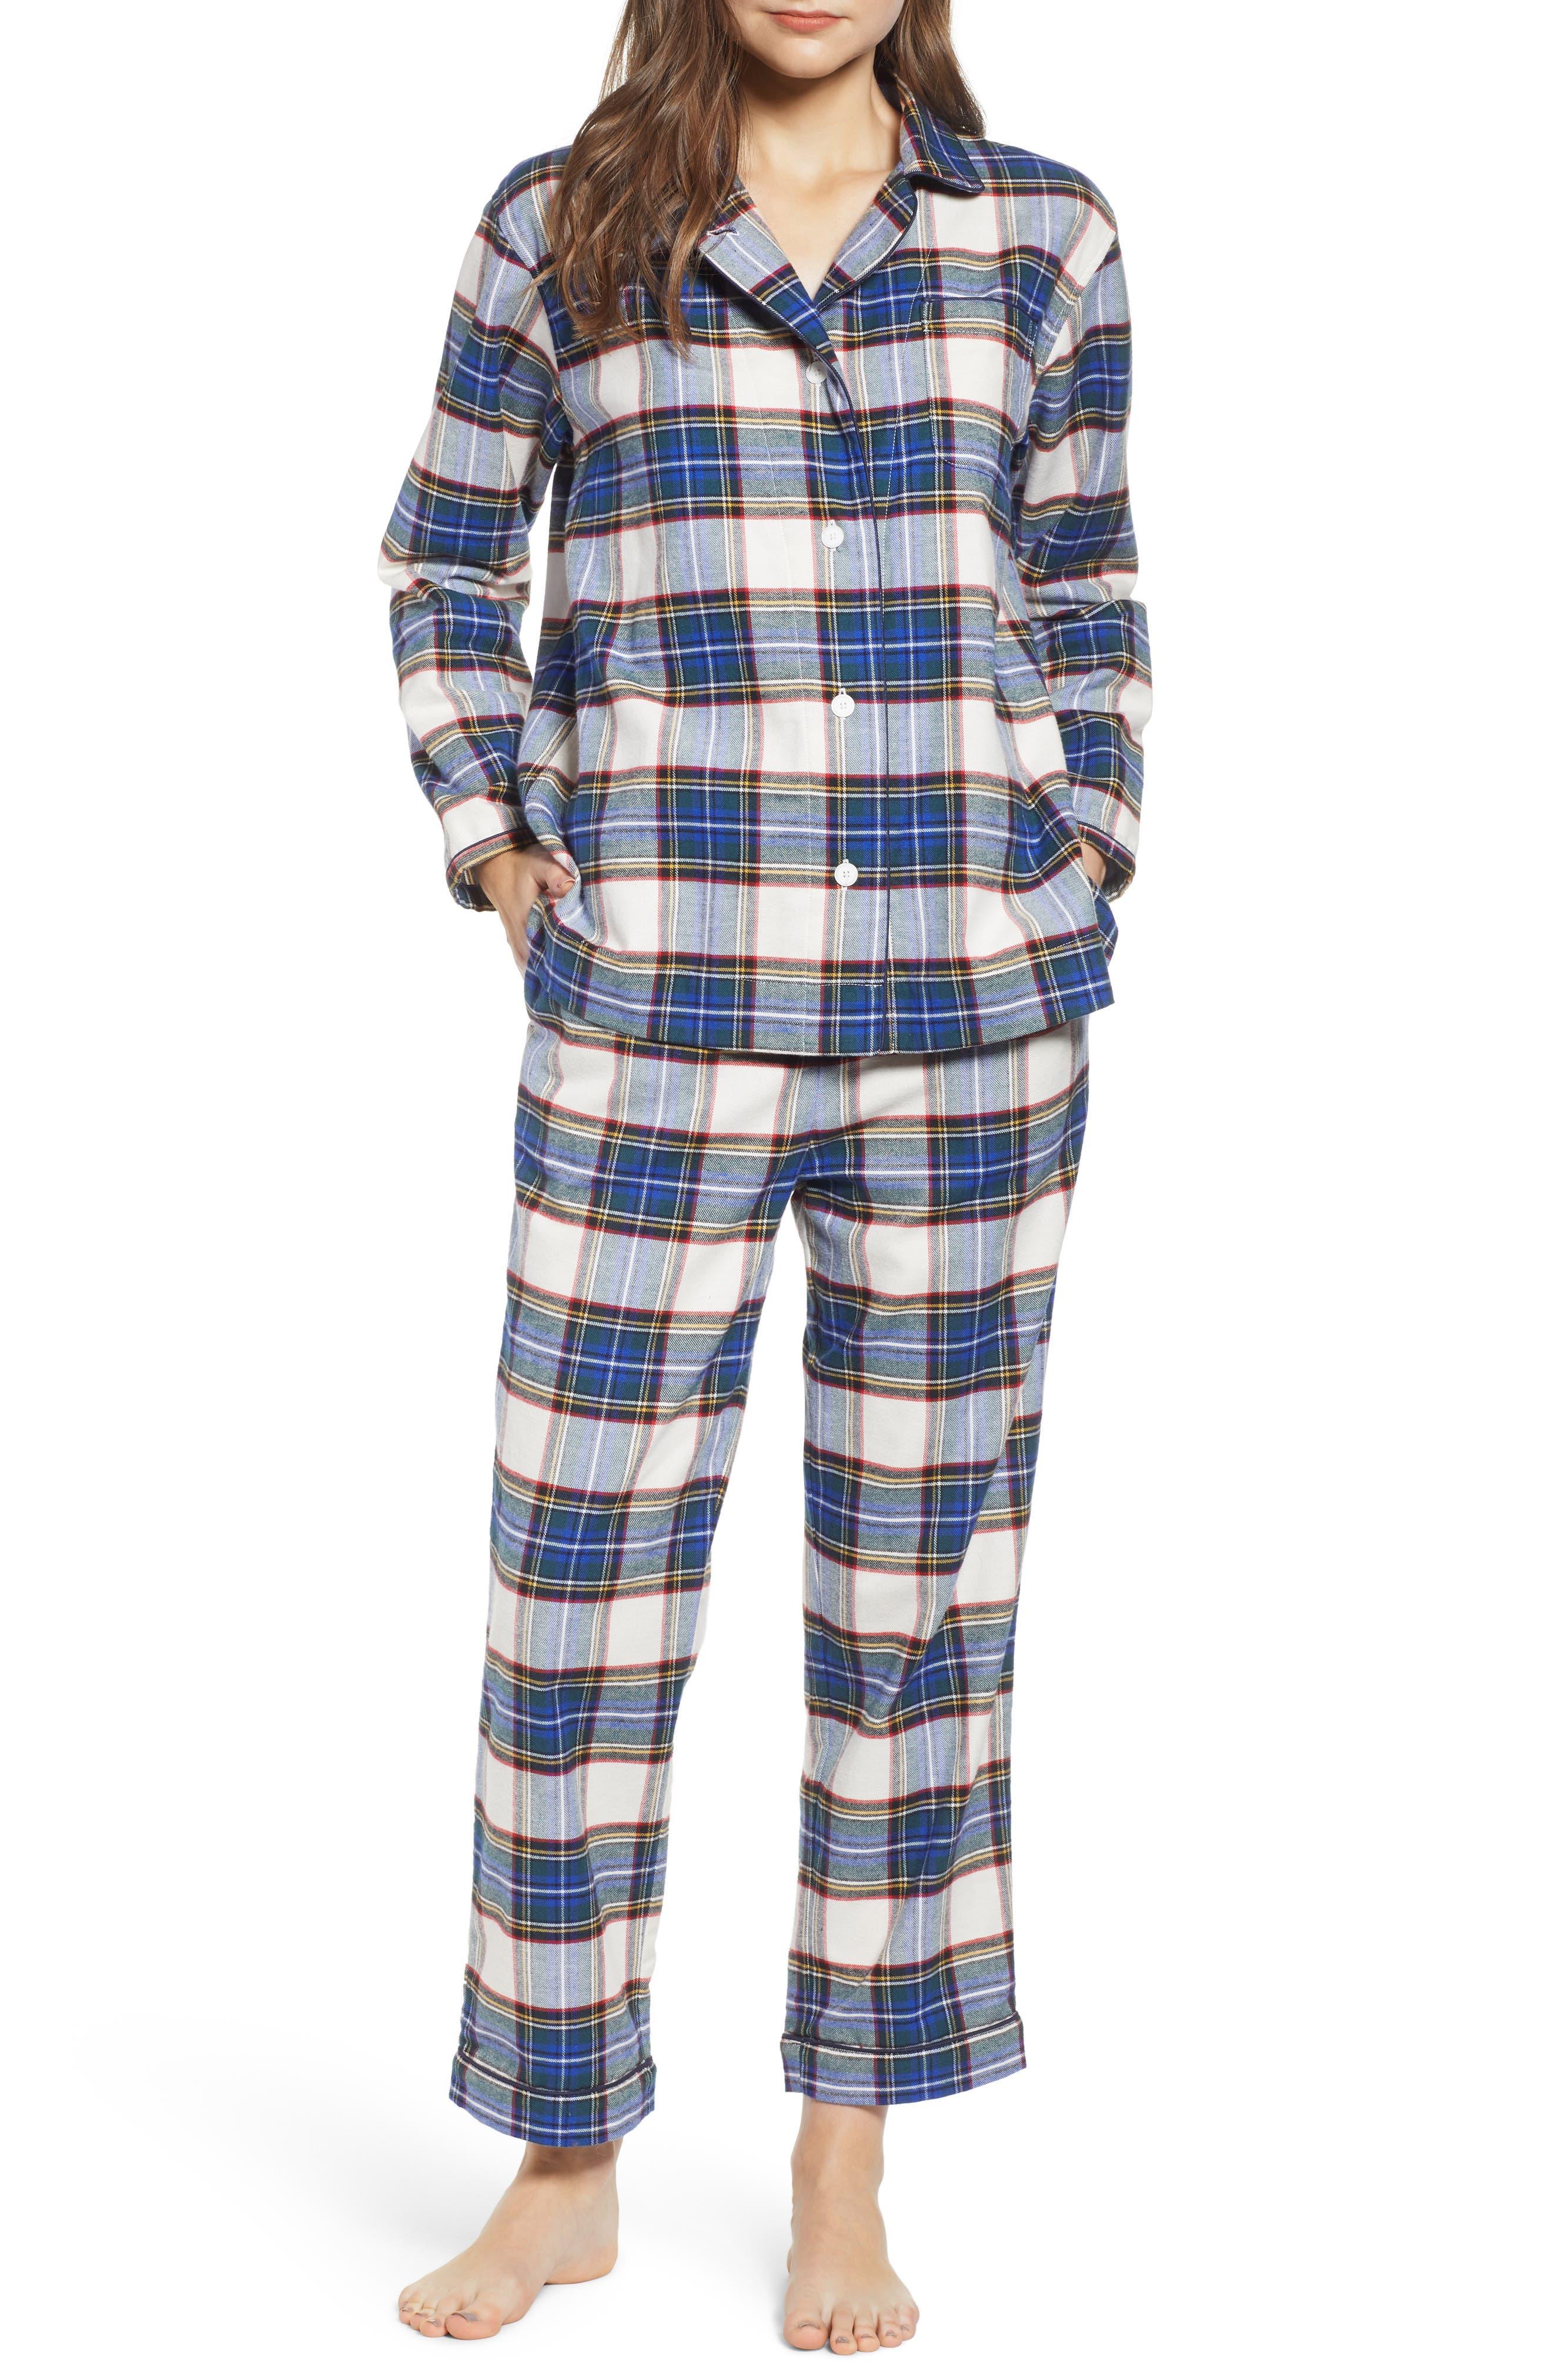 SLEEPY JONES Pajamas in Flannel Plaid